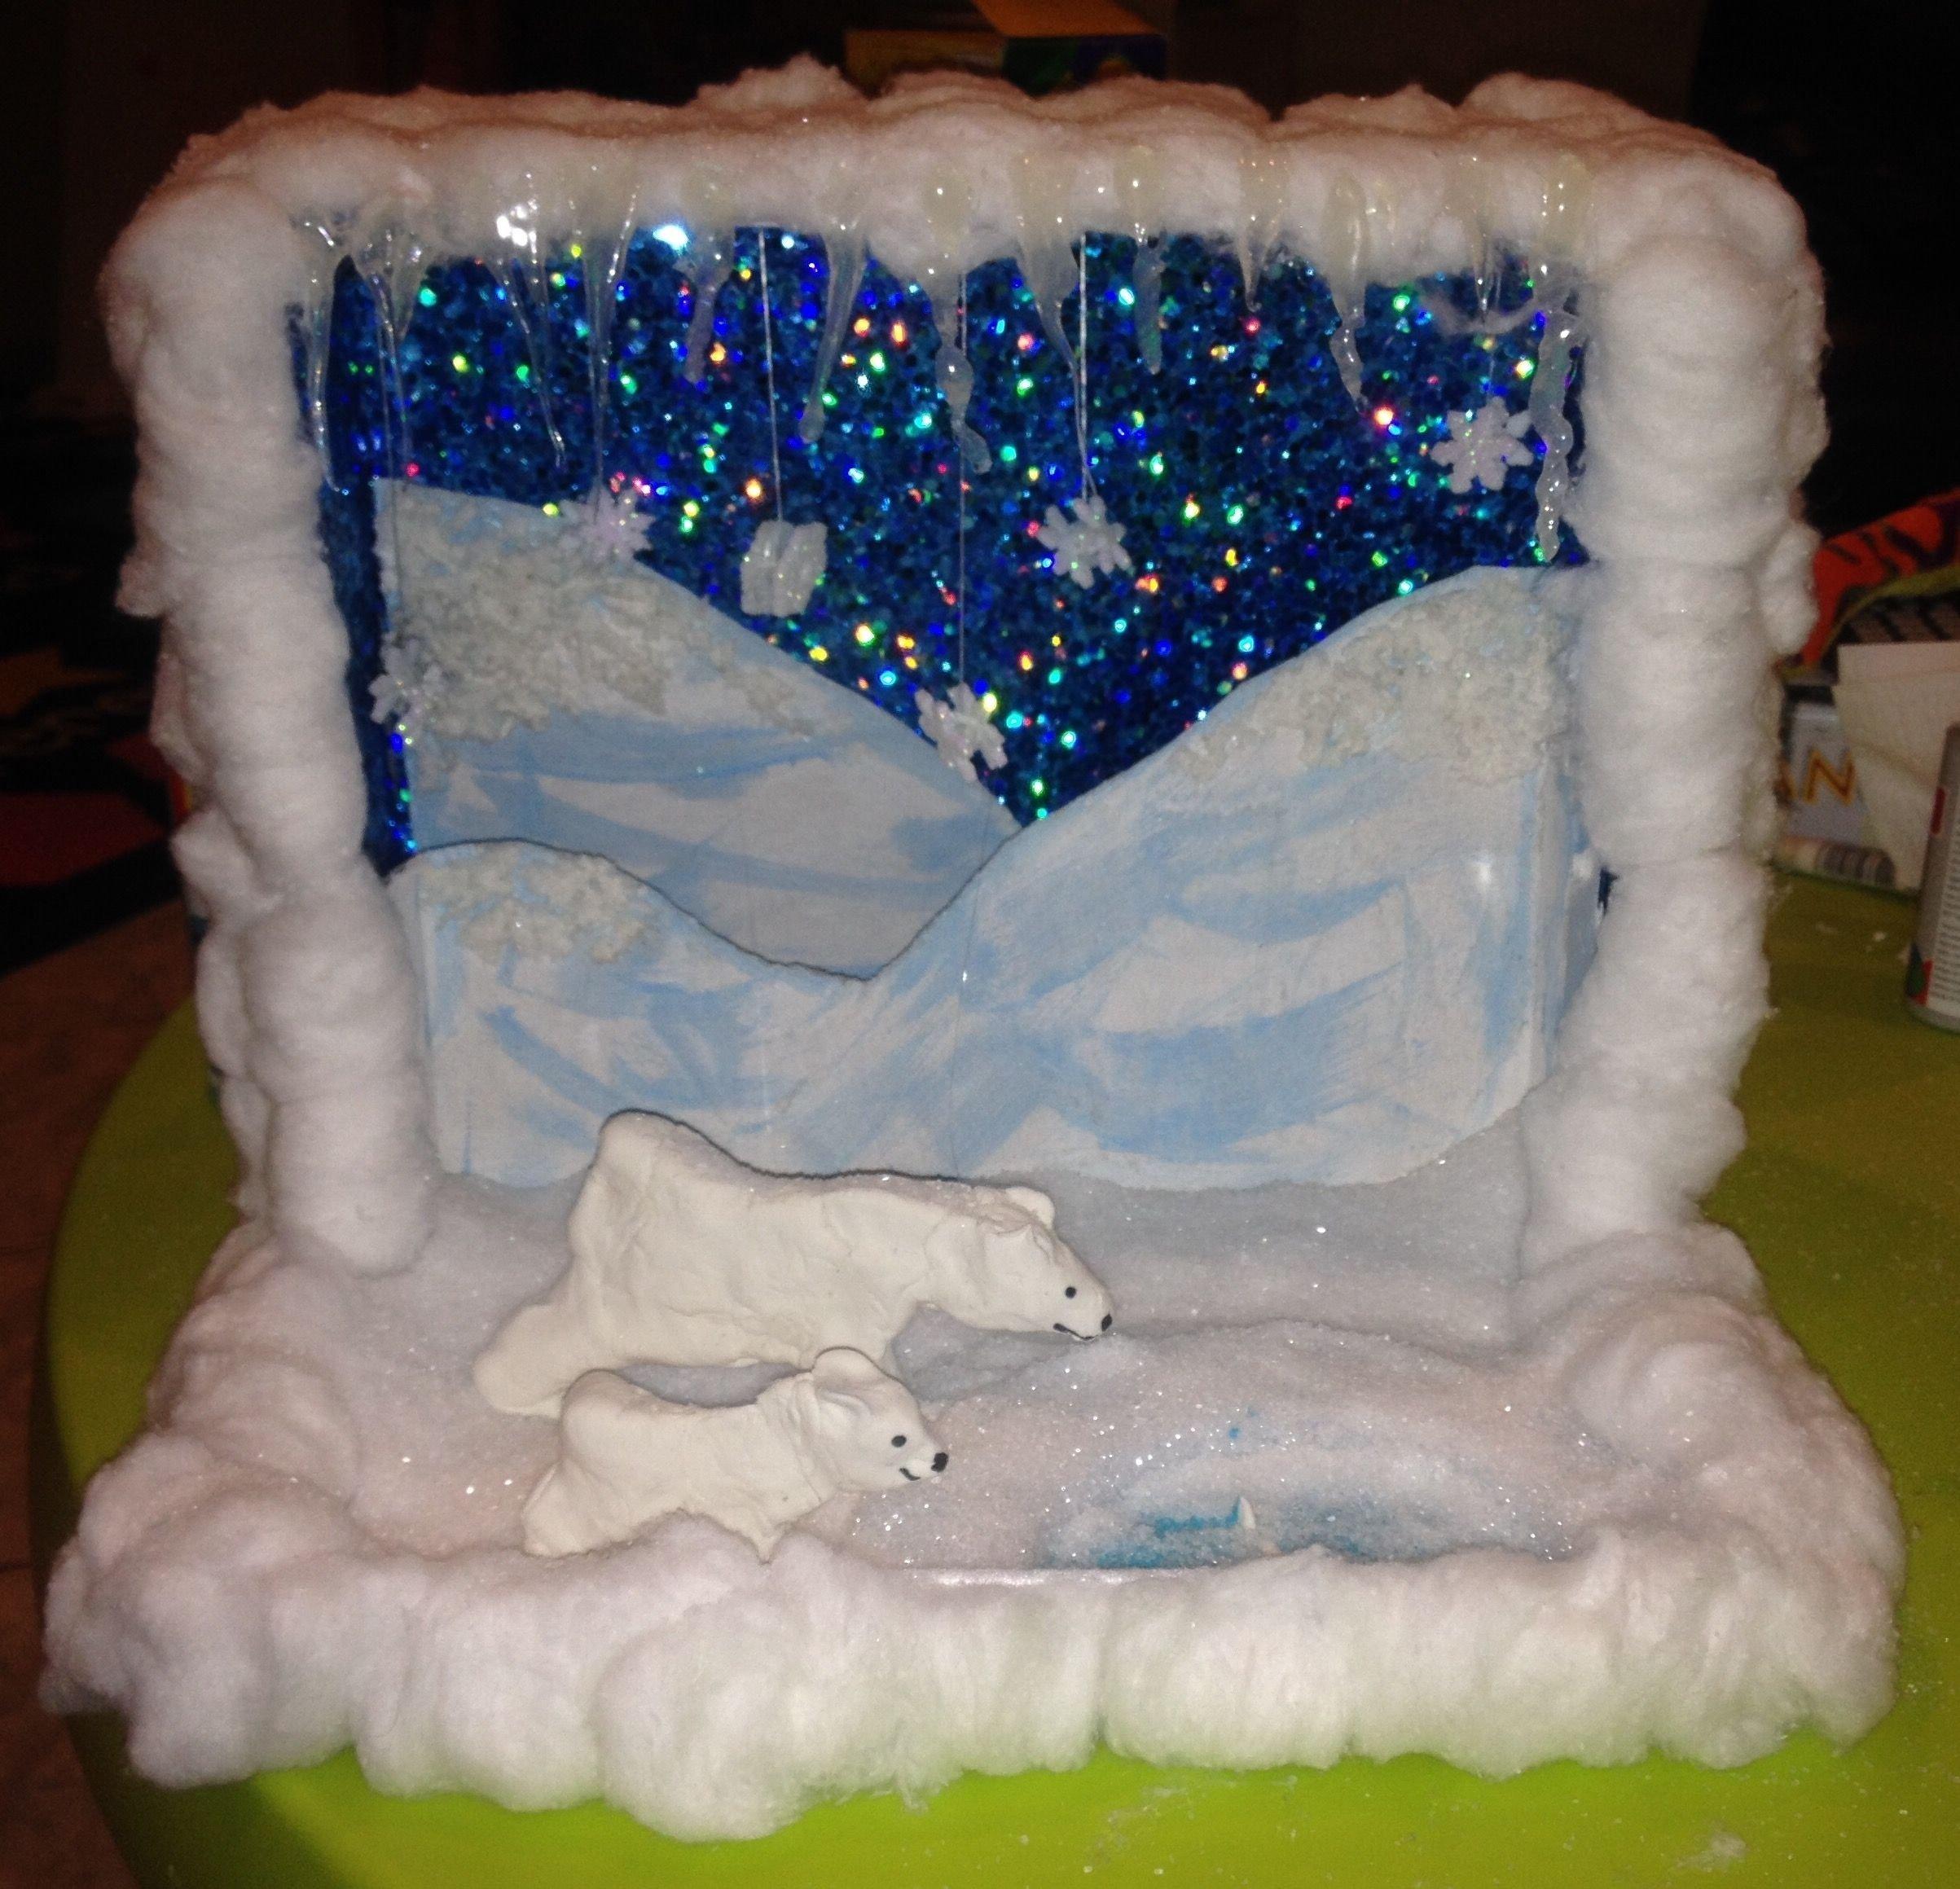 10 Stylish Science Projects Ideas For Kids polar bear diorama kids pinterest dioramas polar bear and bears 2020